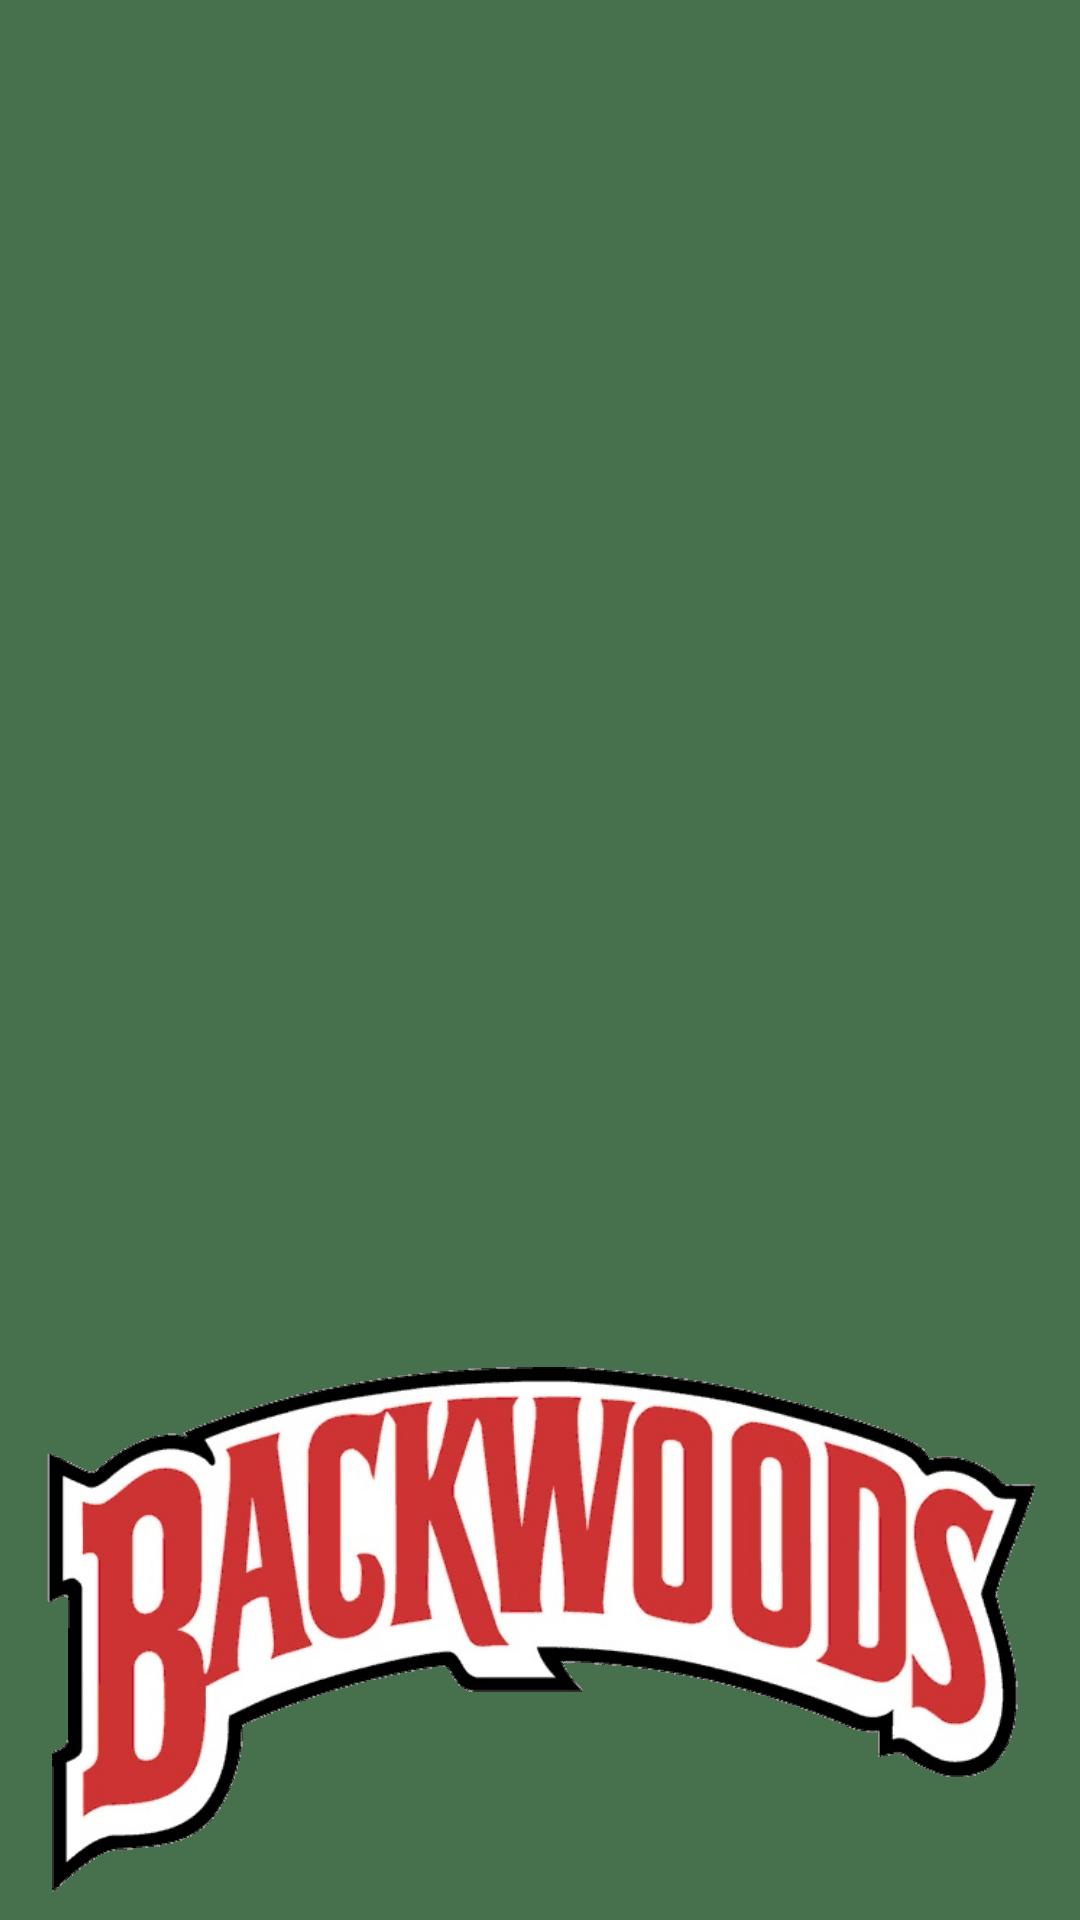 How To Make Live Wallpaper Iphone X Backwood Logo Phantomforsnapchat